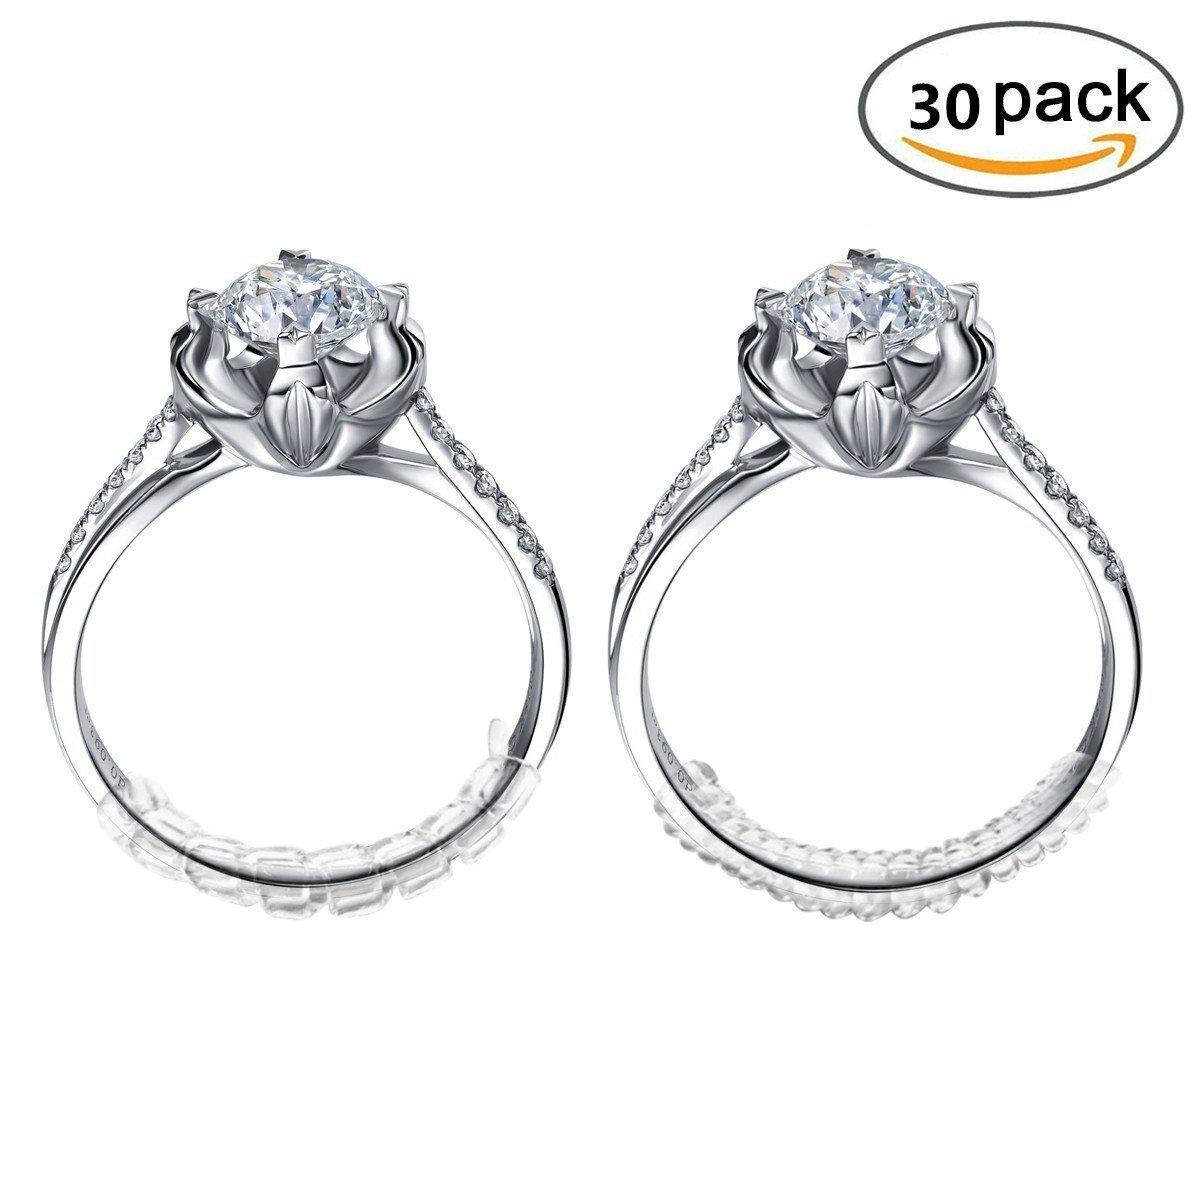 Cheap Platinum Ring Adjuster Find Platinum Ring Adjuster